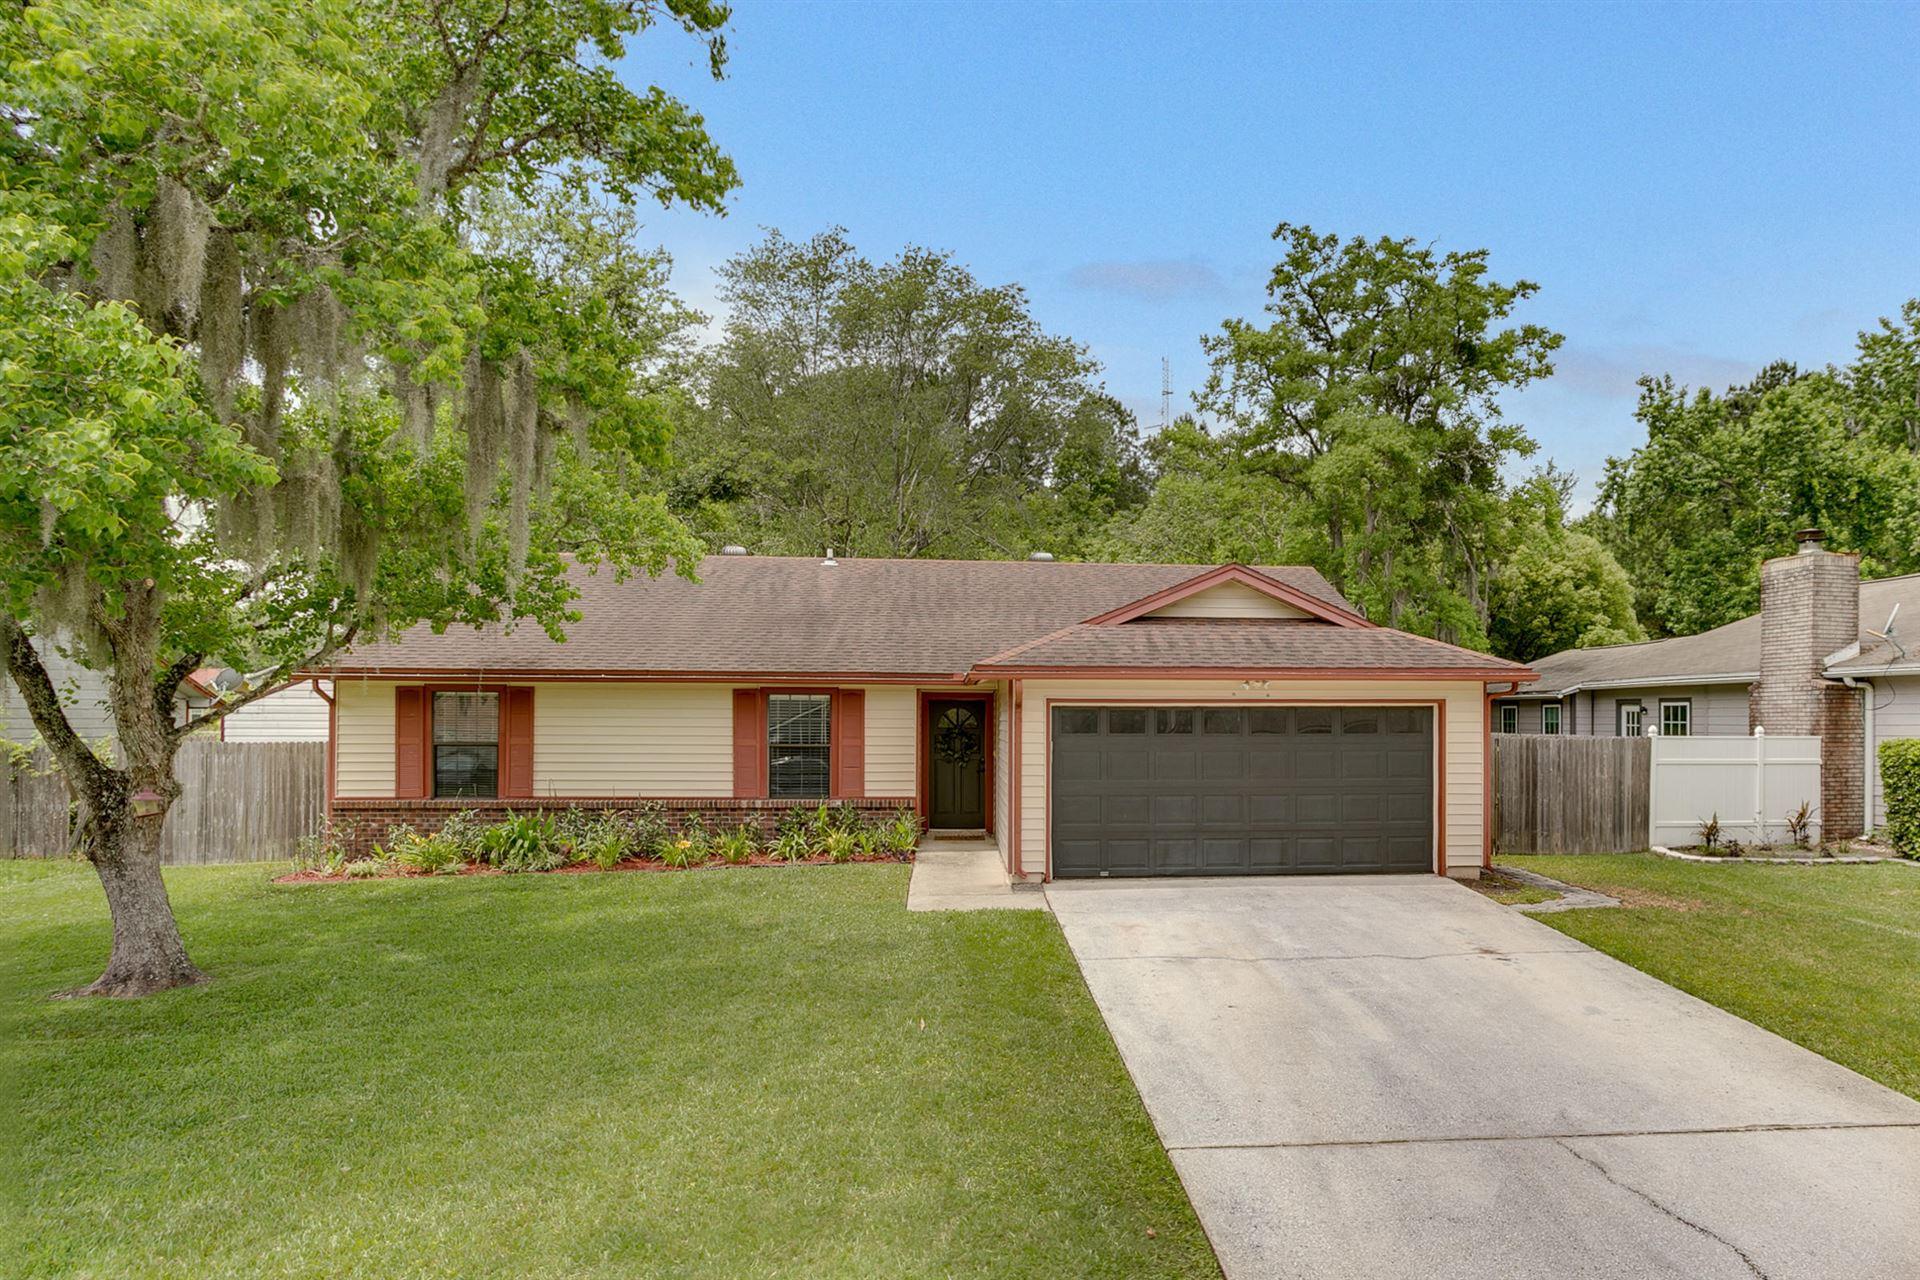 1714 SANDY HOLLOW LOOP #Lot No: 6, Middleburg, FL 32068 - MLS#: 1109937